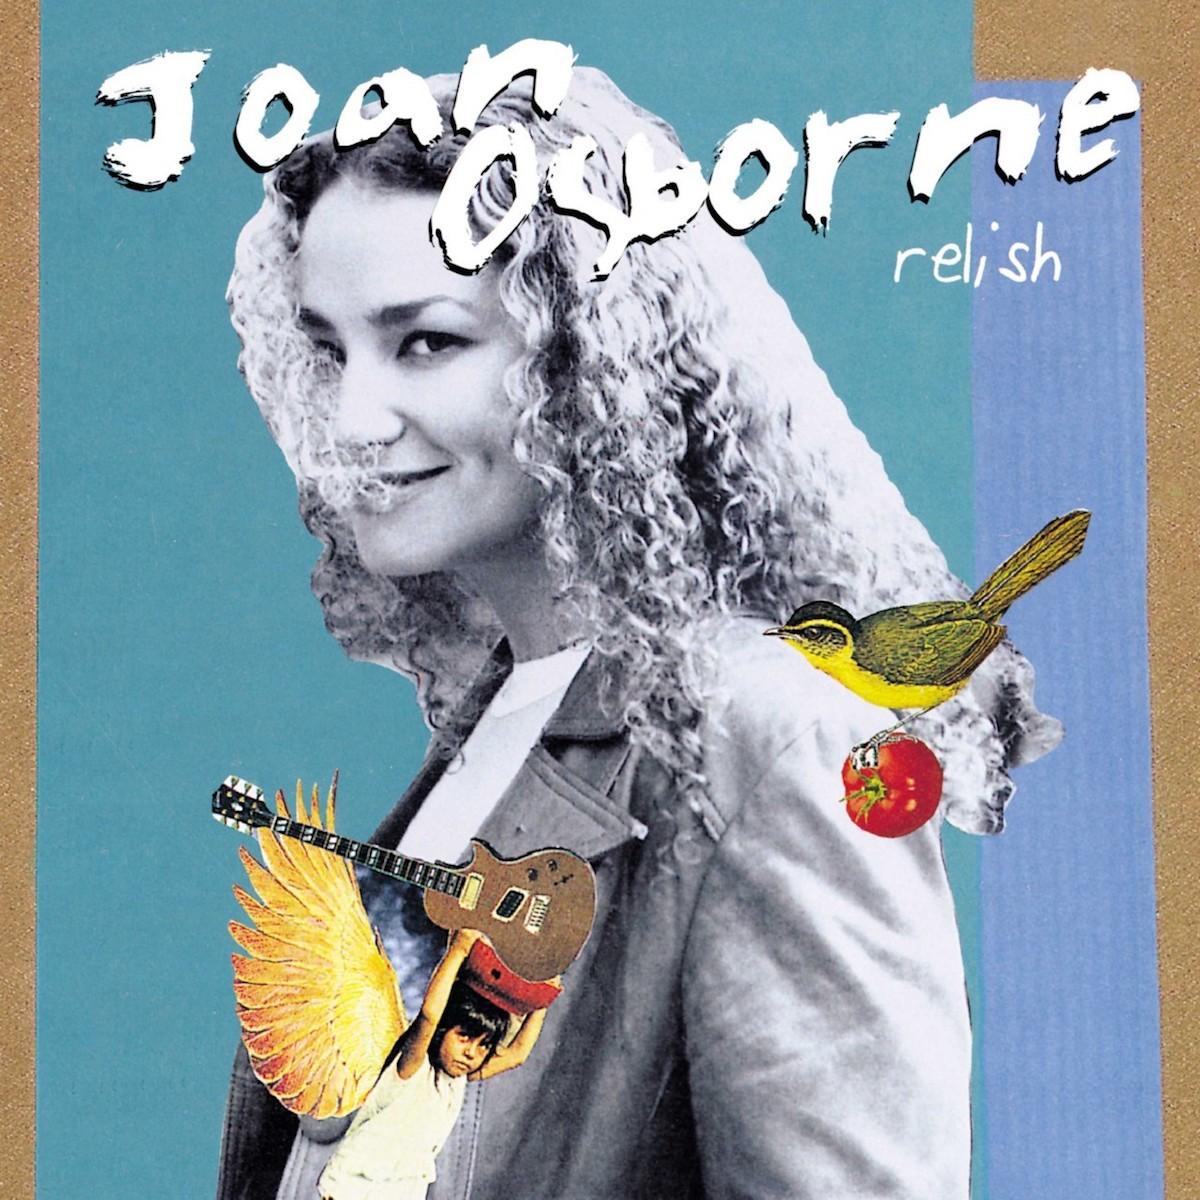 Joan Osborne - Relish (1995) album cover